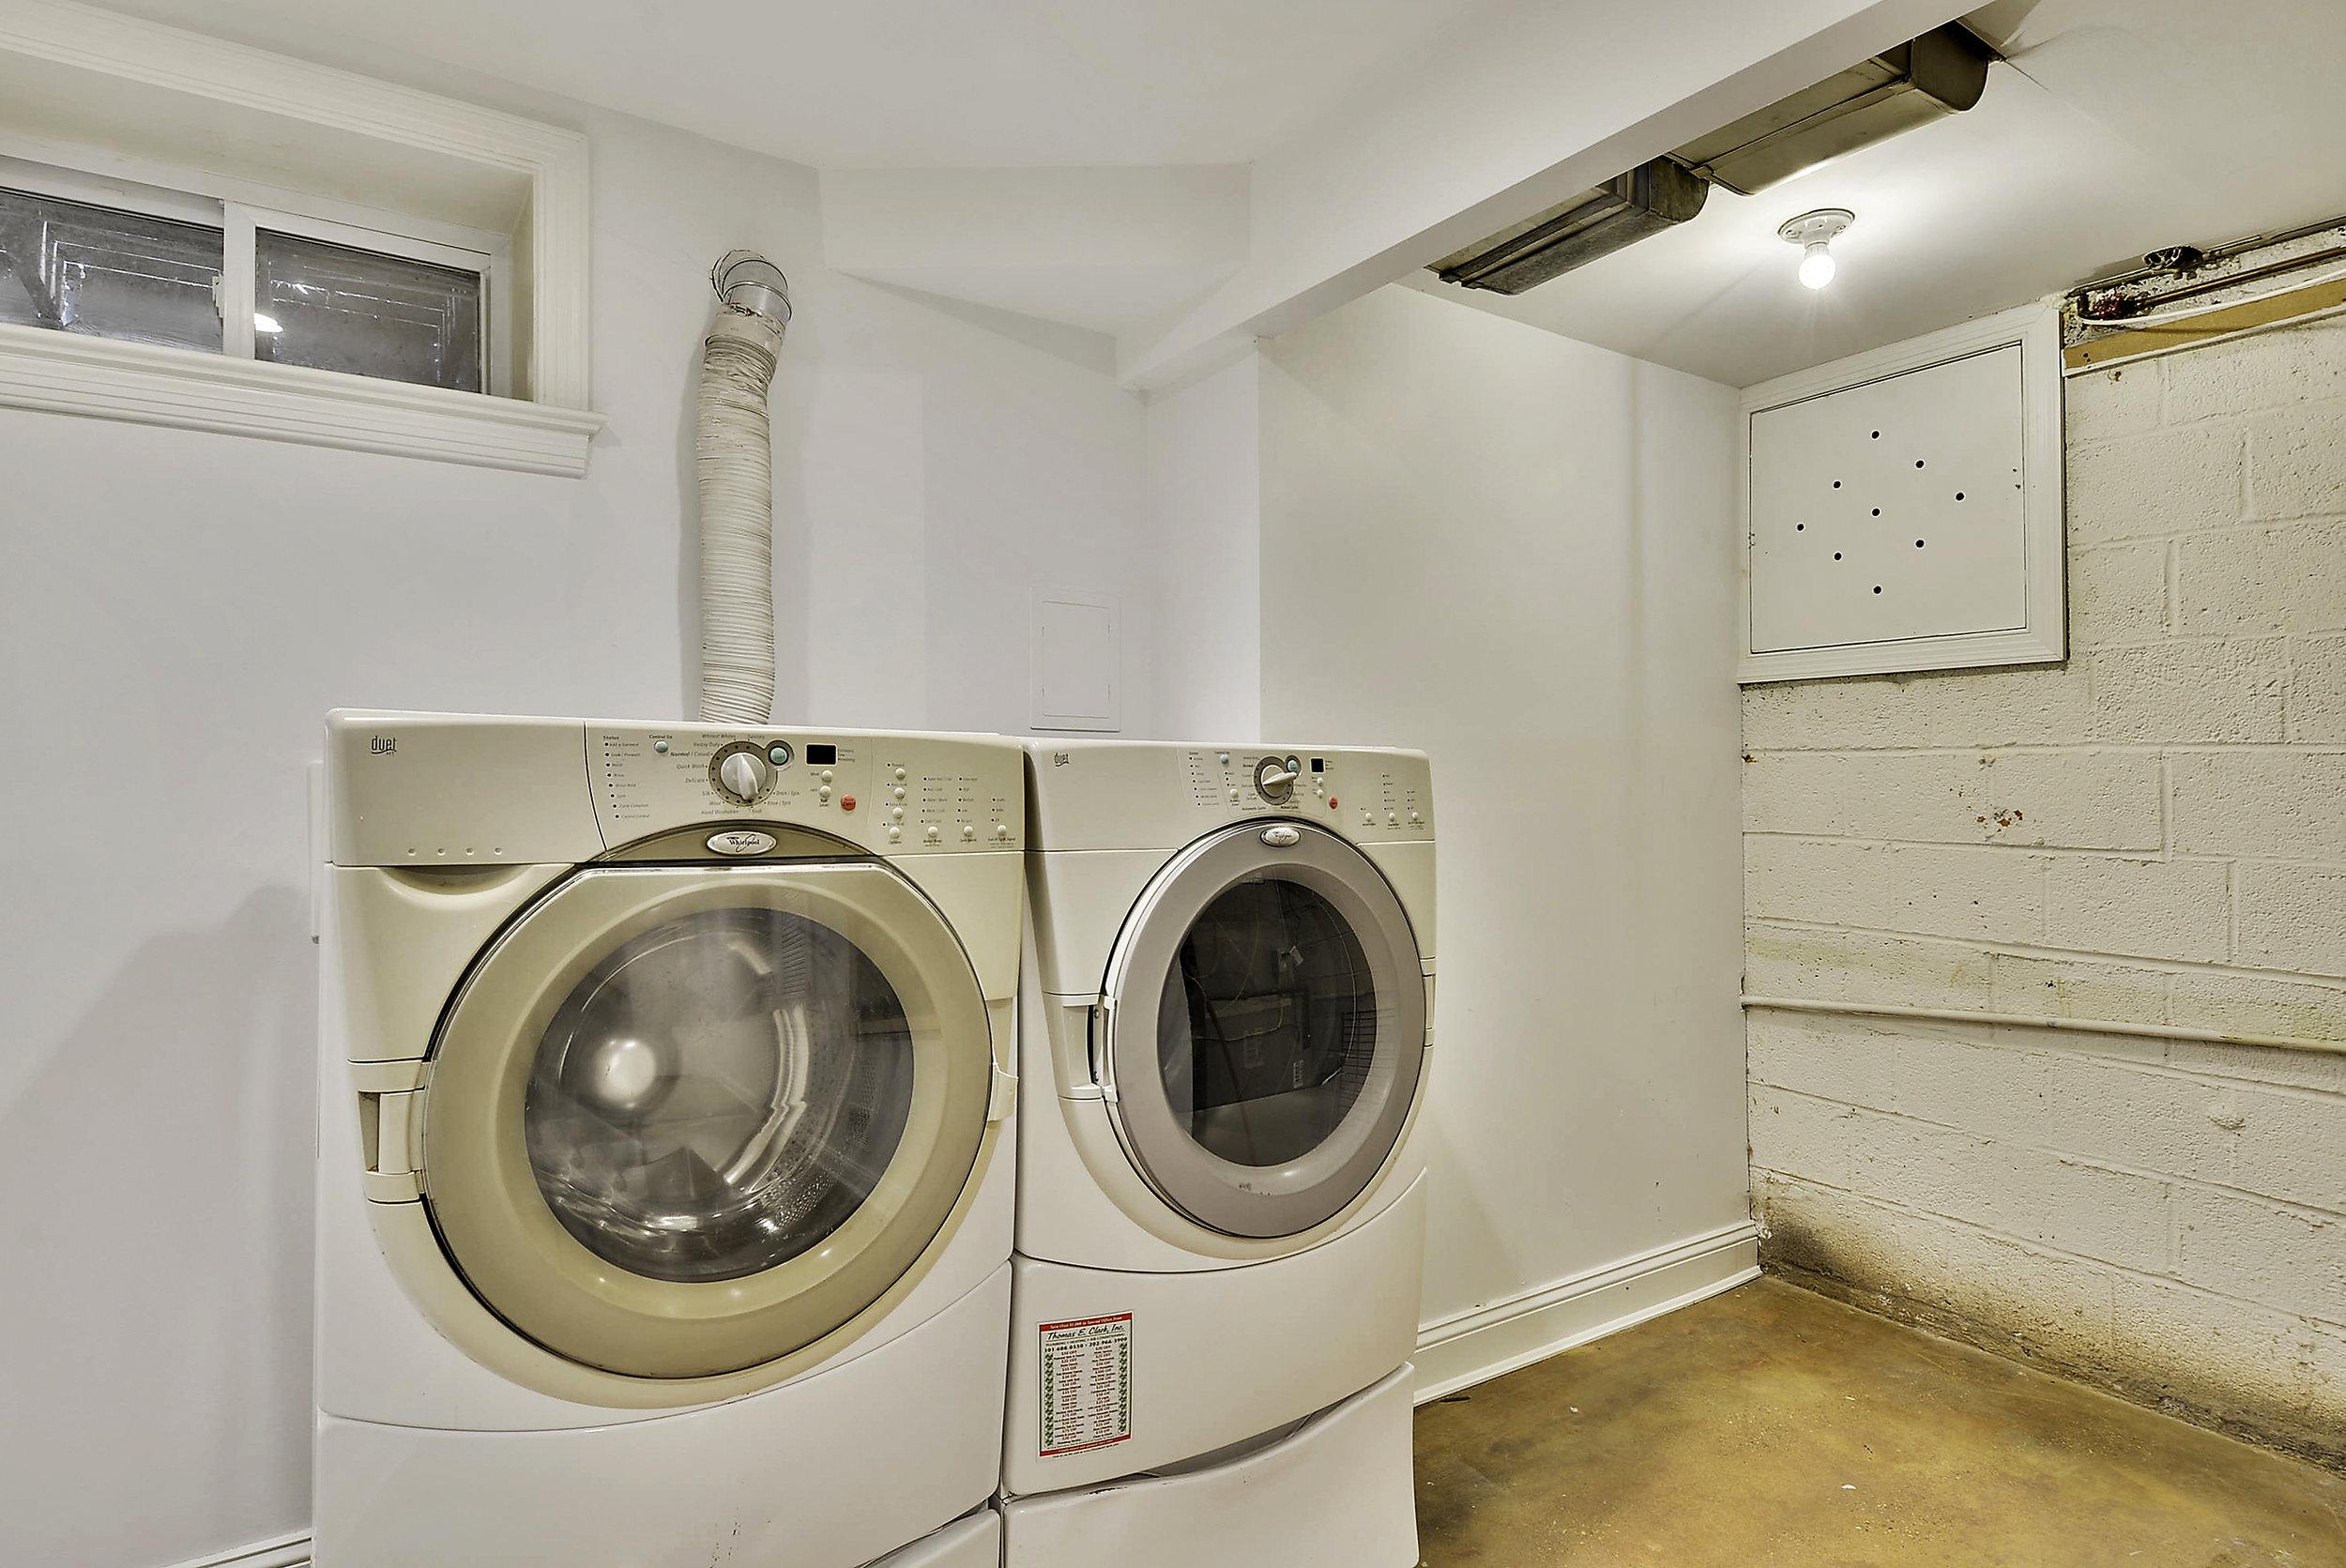 Lower Level-Washer Dryer-_DSC5849.JPG